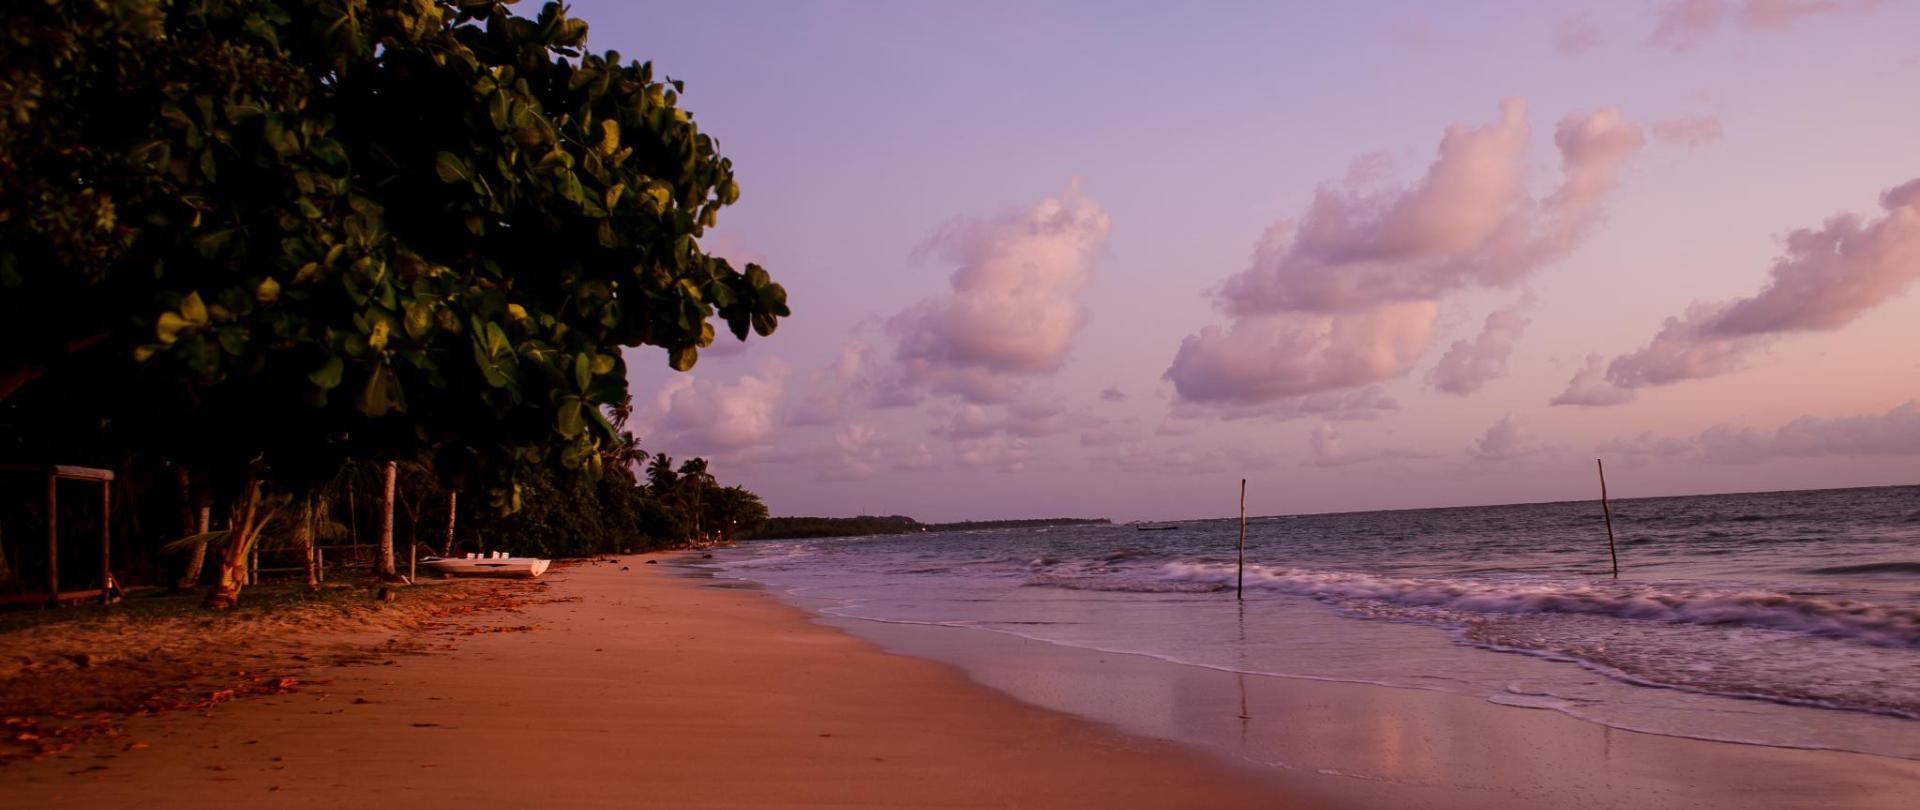 Praia 1.jpg